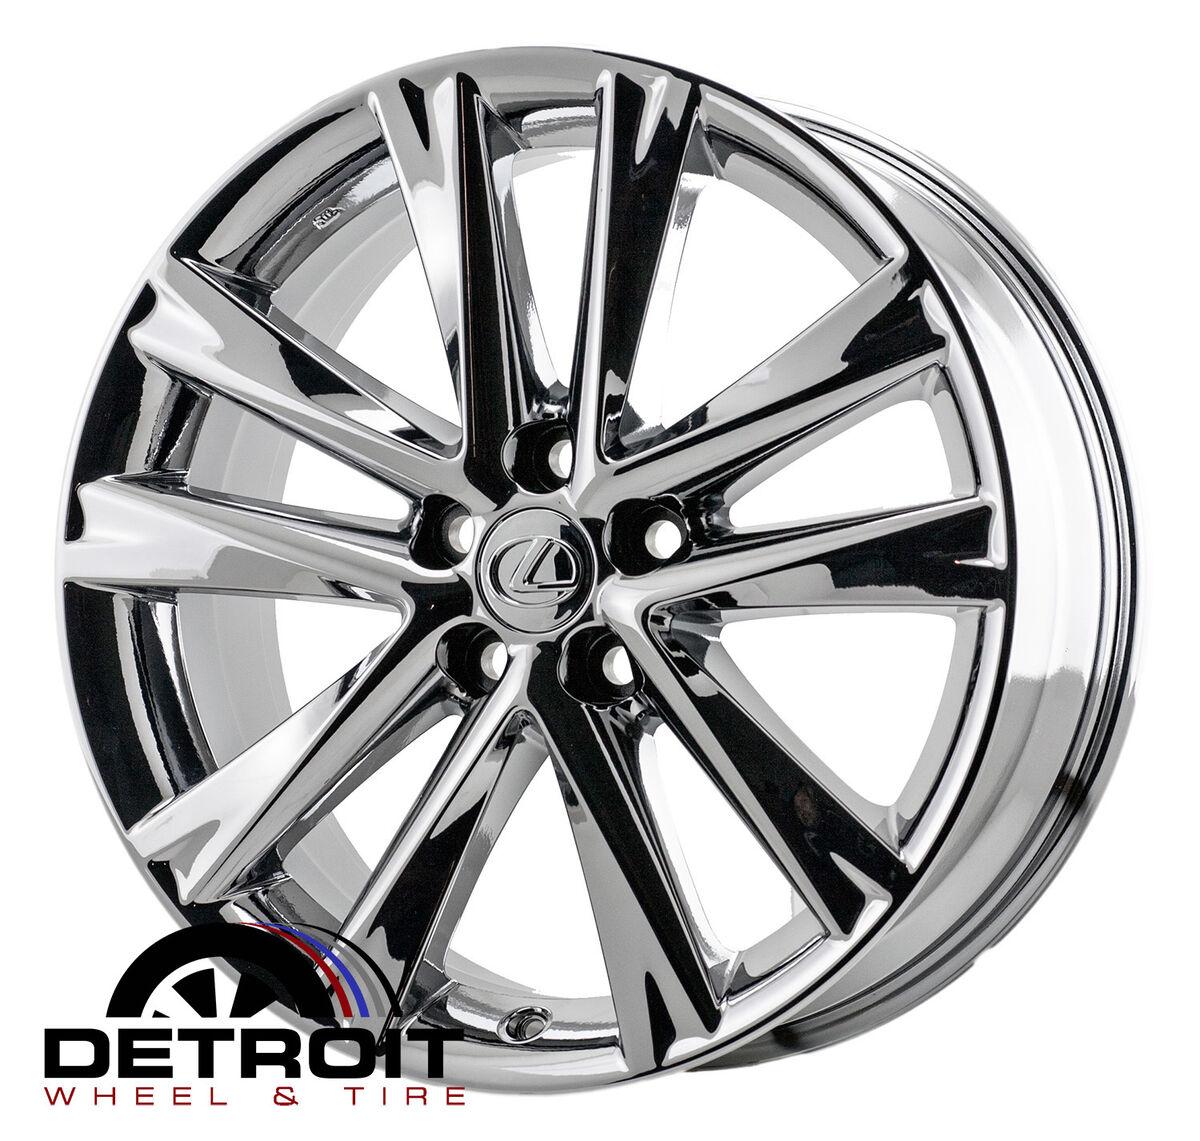 "Lexus RX350 F Sport 19"" Chrome Wheels Rims 2013'"